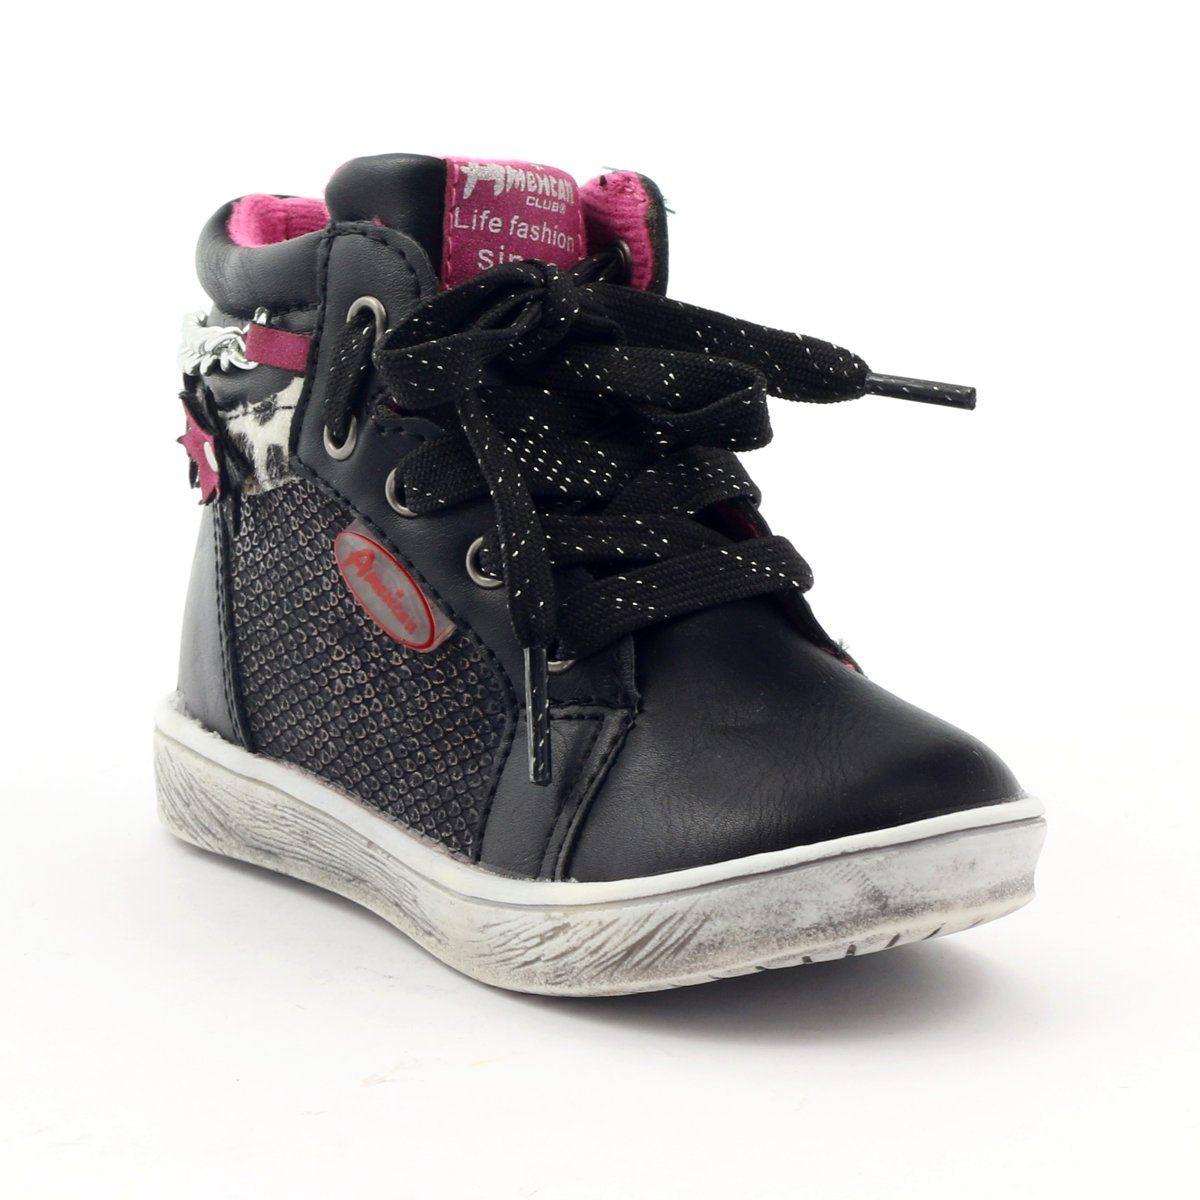 American Club Trzewiki Sportowe Kwiatek American 10108 Rozowe Zolte Czarne Club Shoes Childrens Shoes Kid Shoes